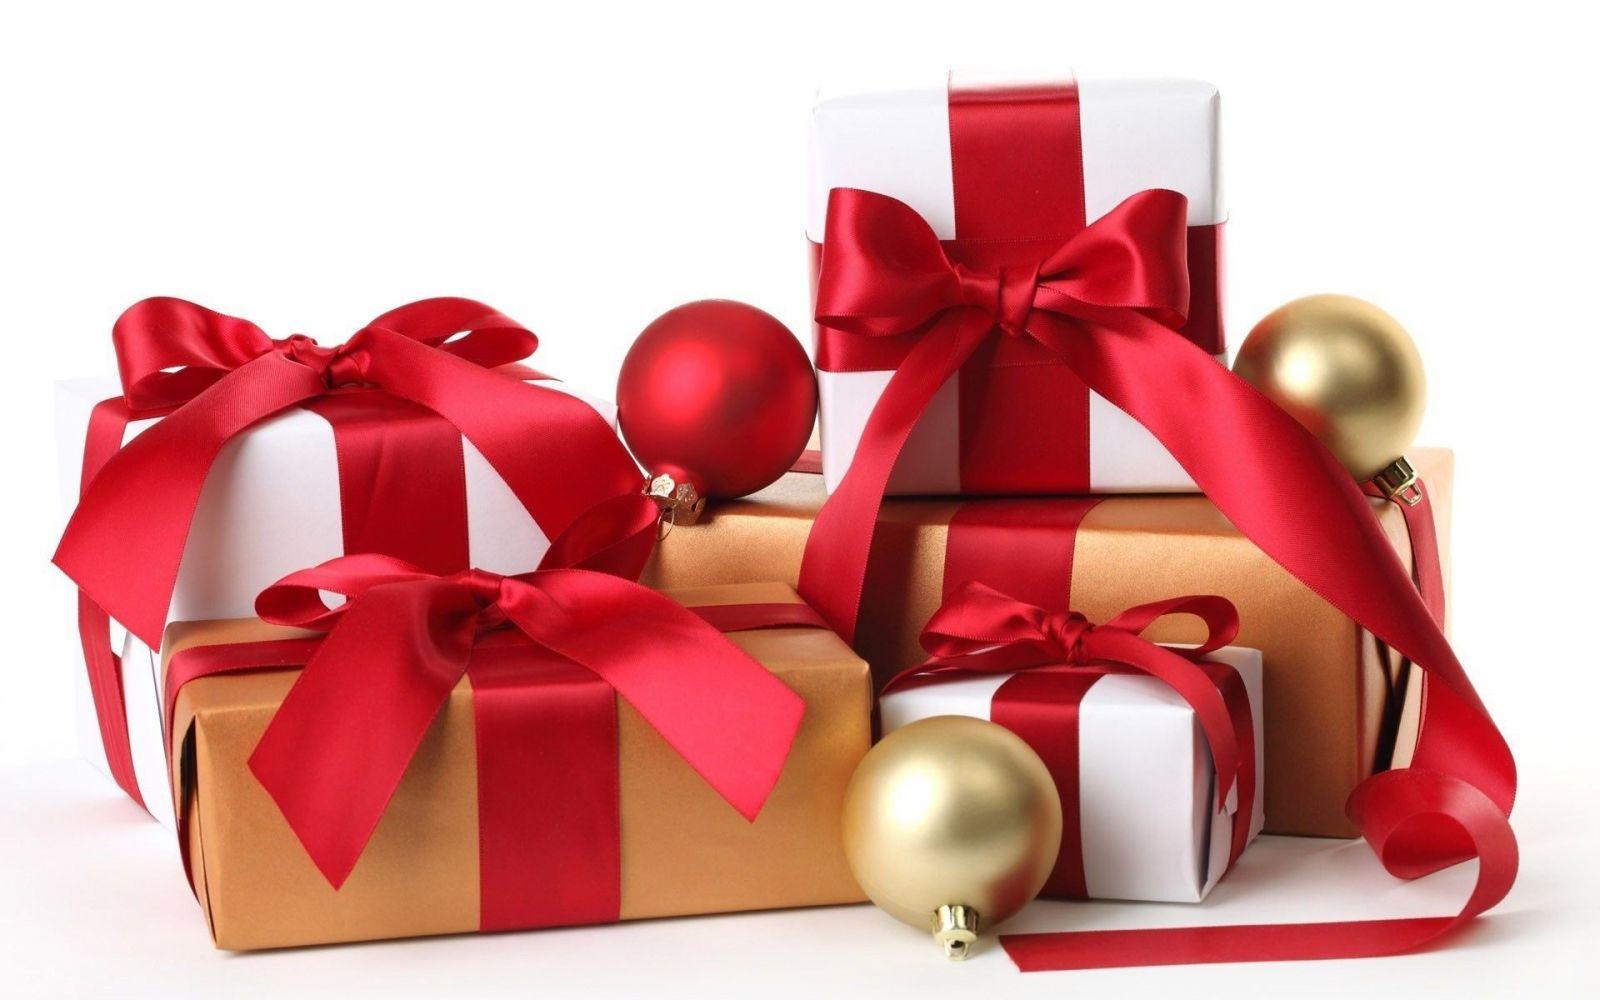 Мы дарим подарки по-английски 139